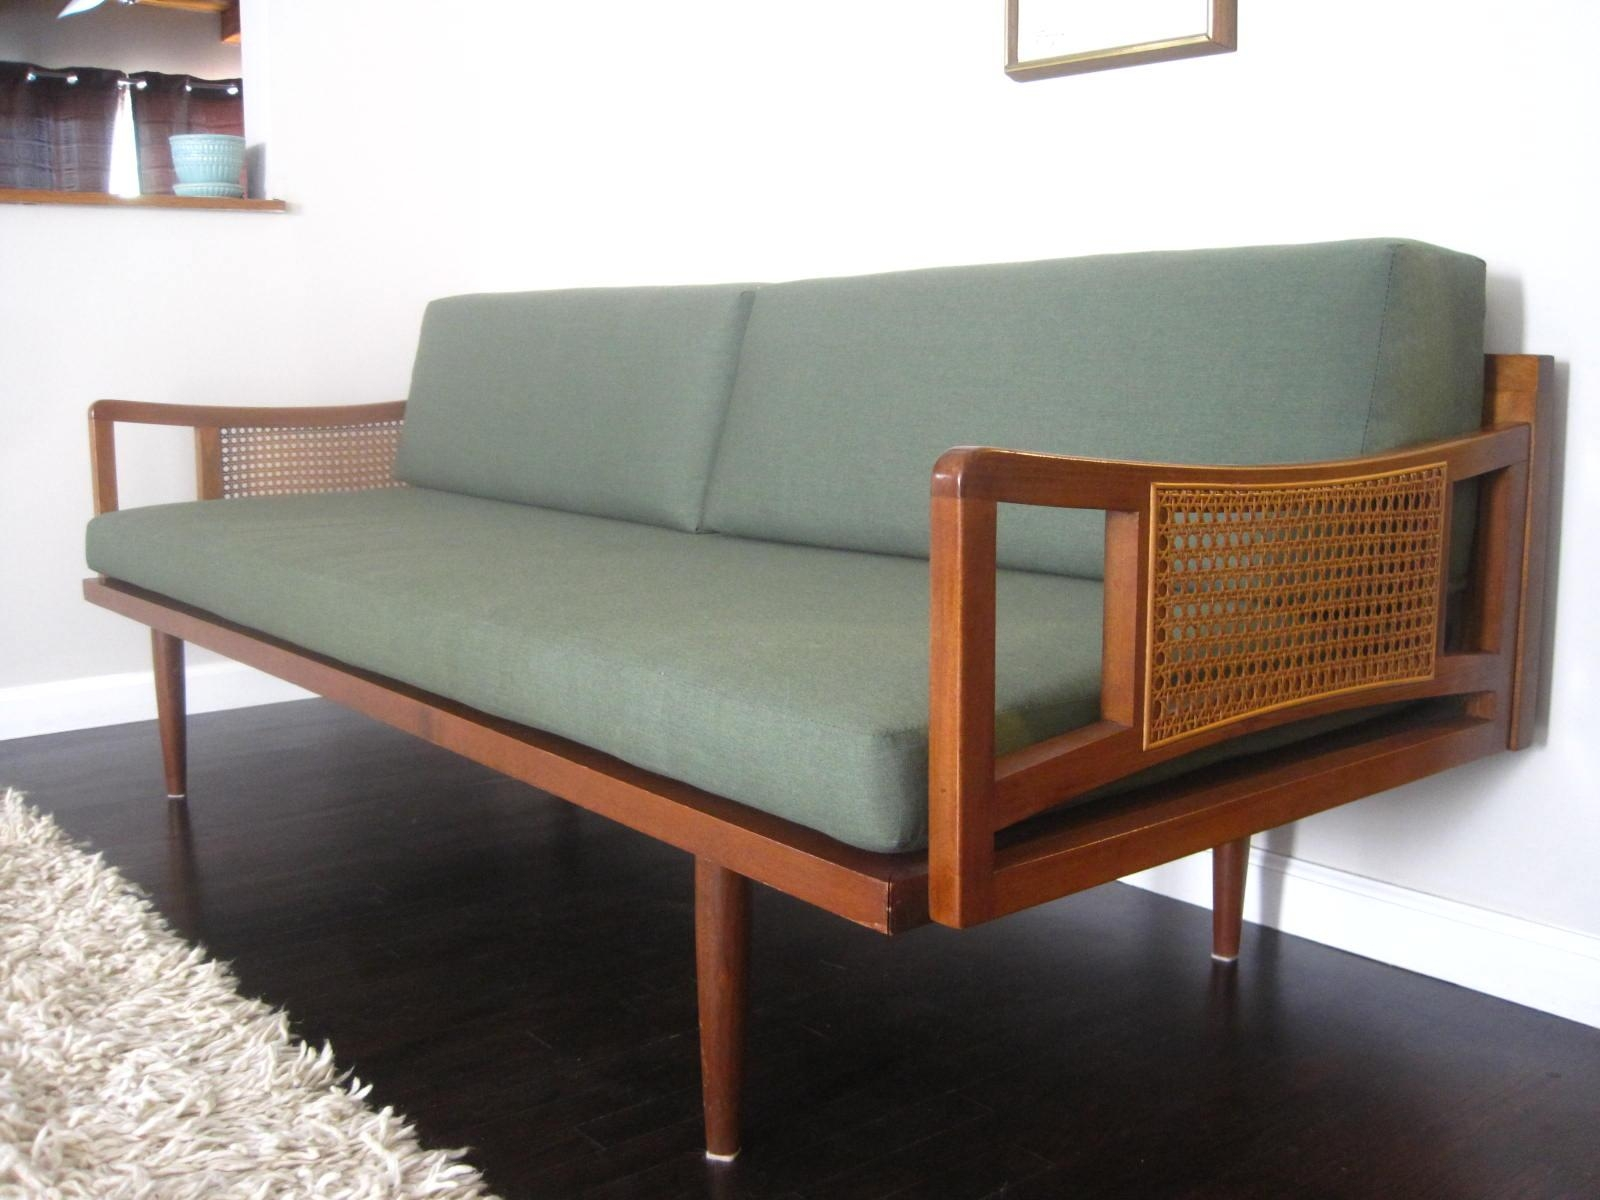 Decor: Lovable Vintage Danish Modern Furniture Bench Mid Century Regarding Danish Modern Sofas (View 3 of 20)